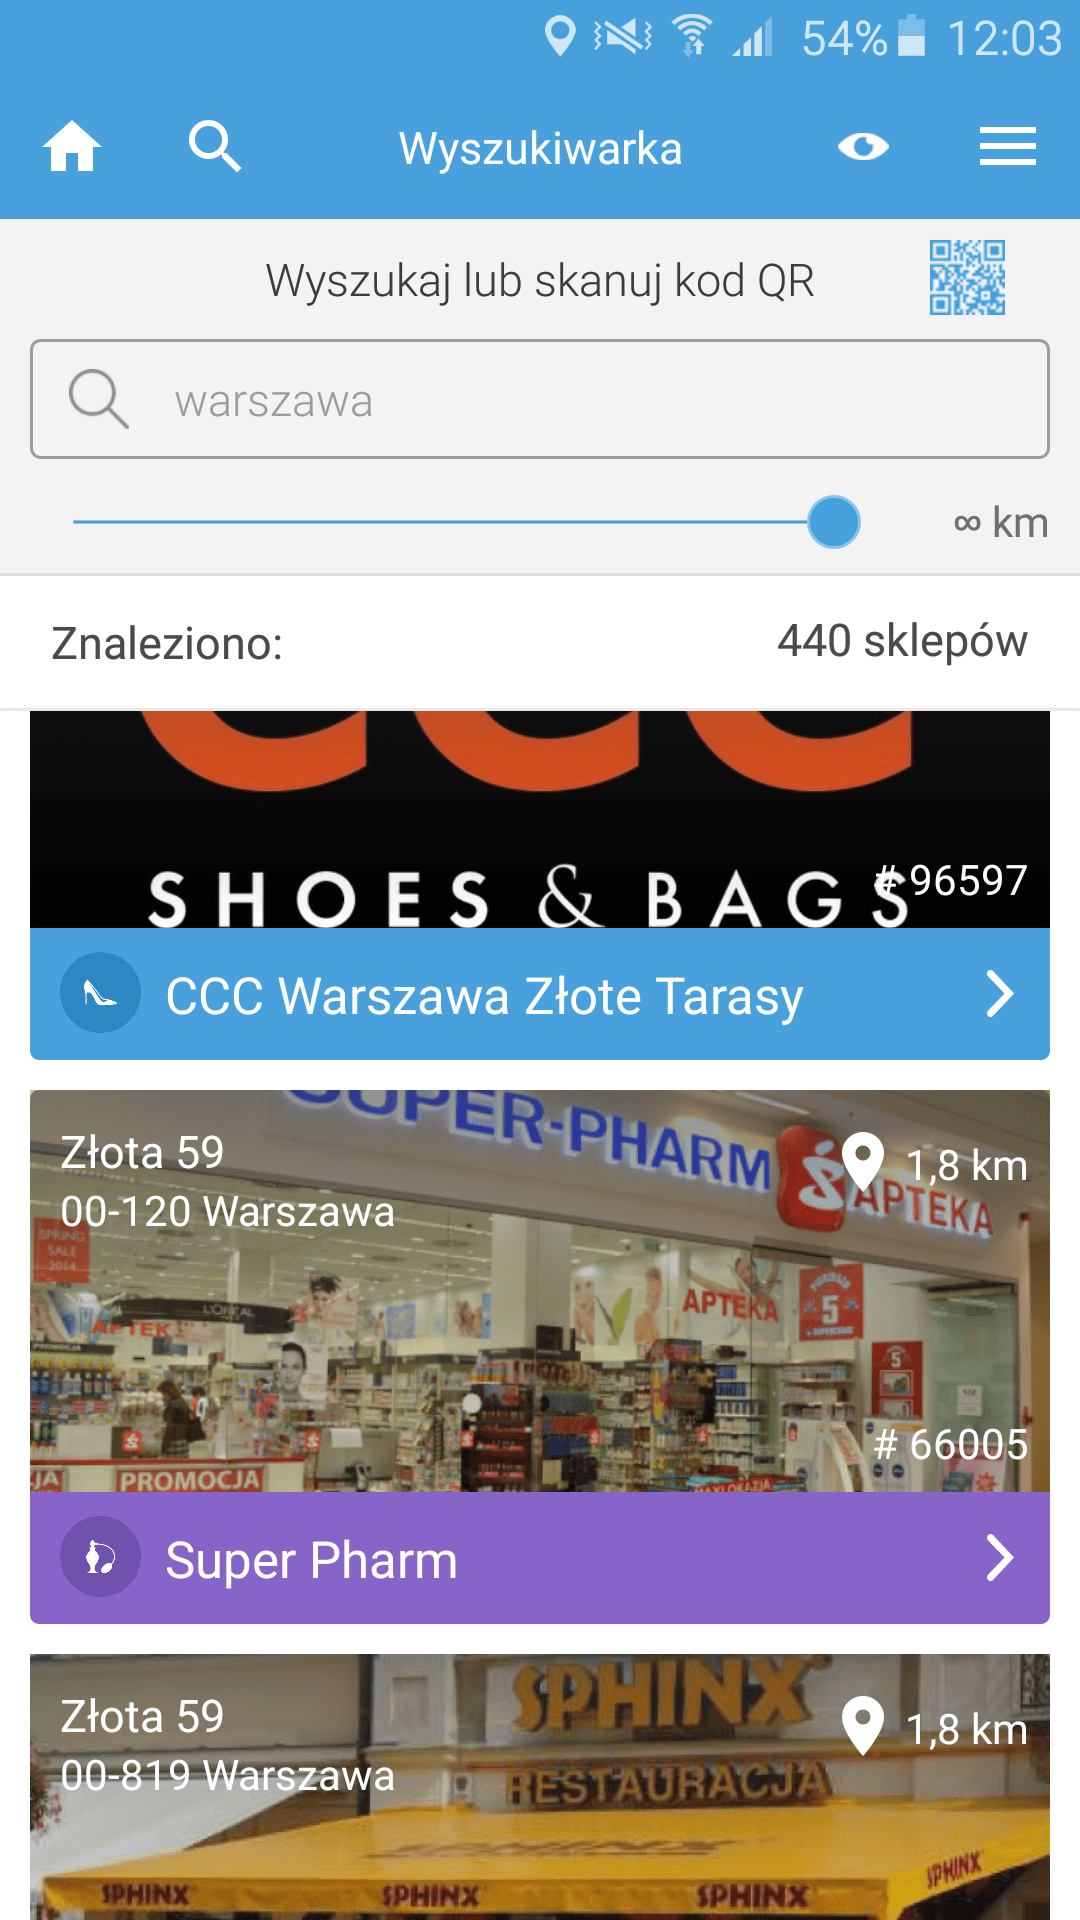 MyShop.mobi aplikacja